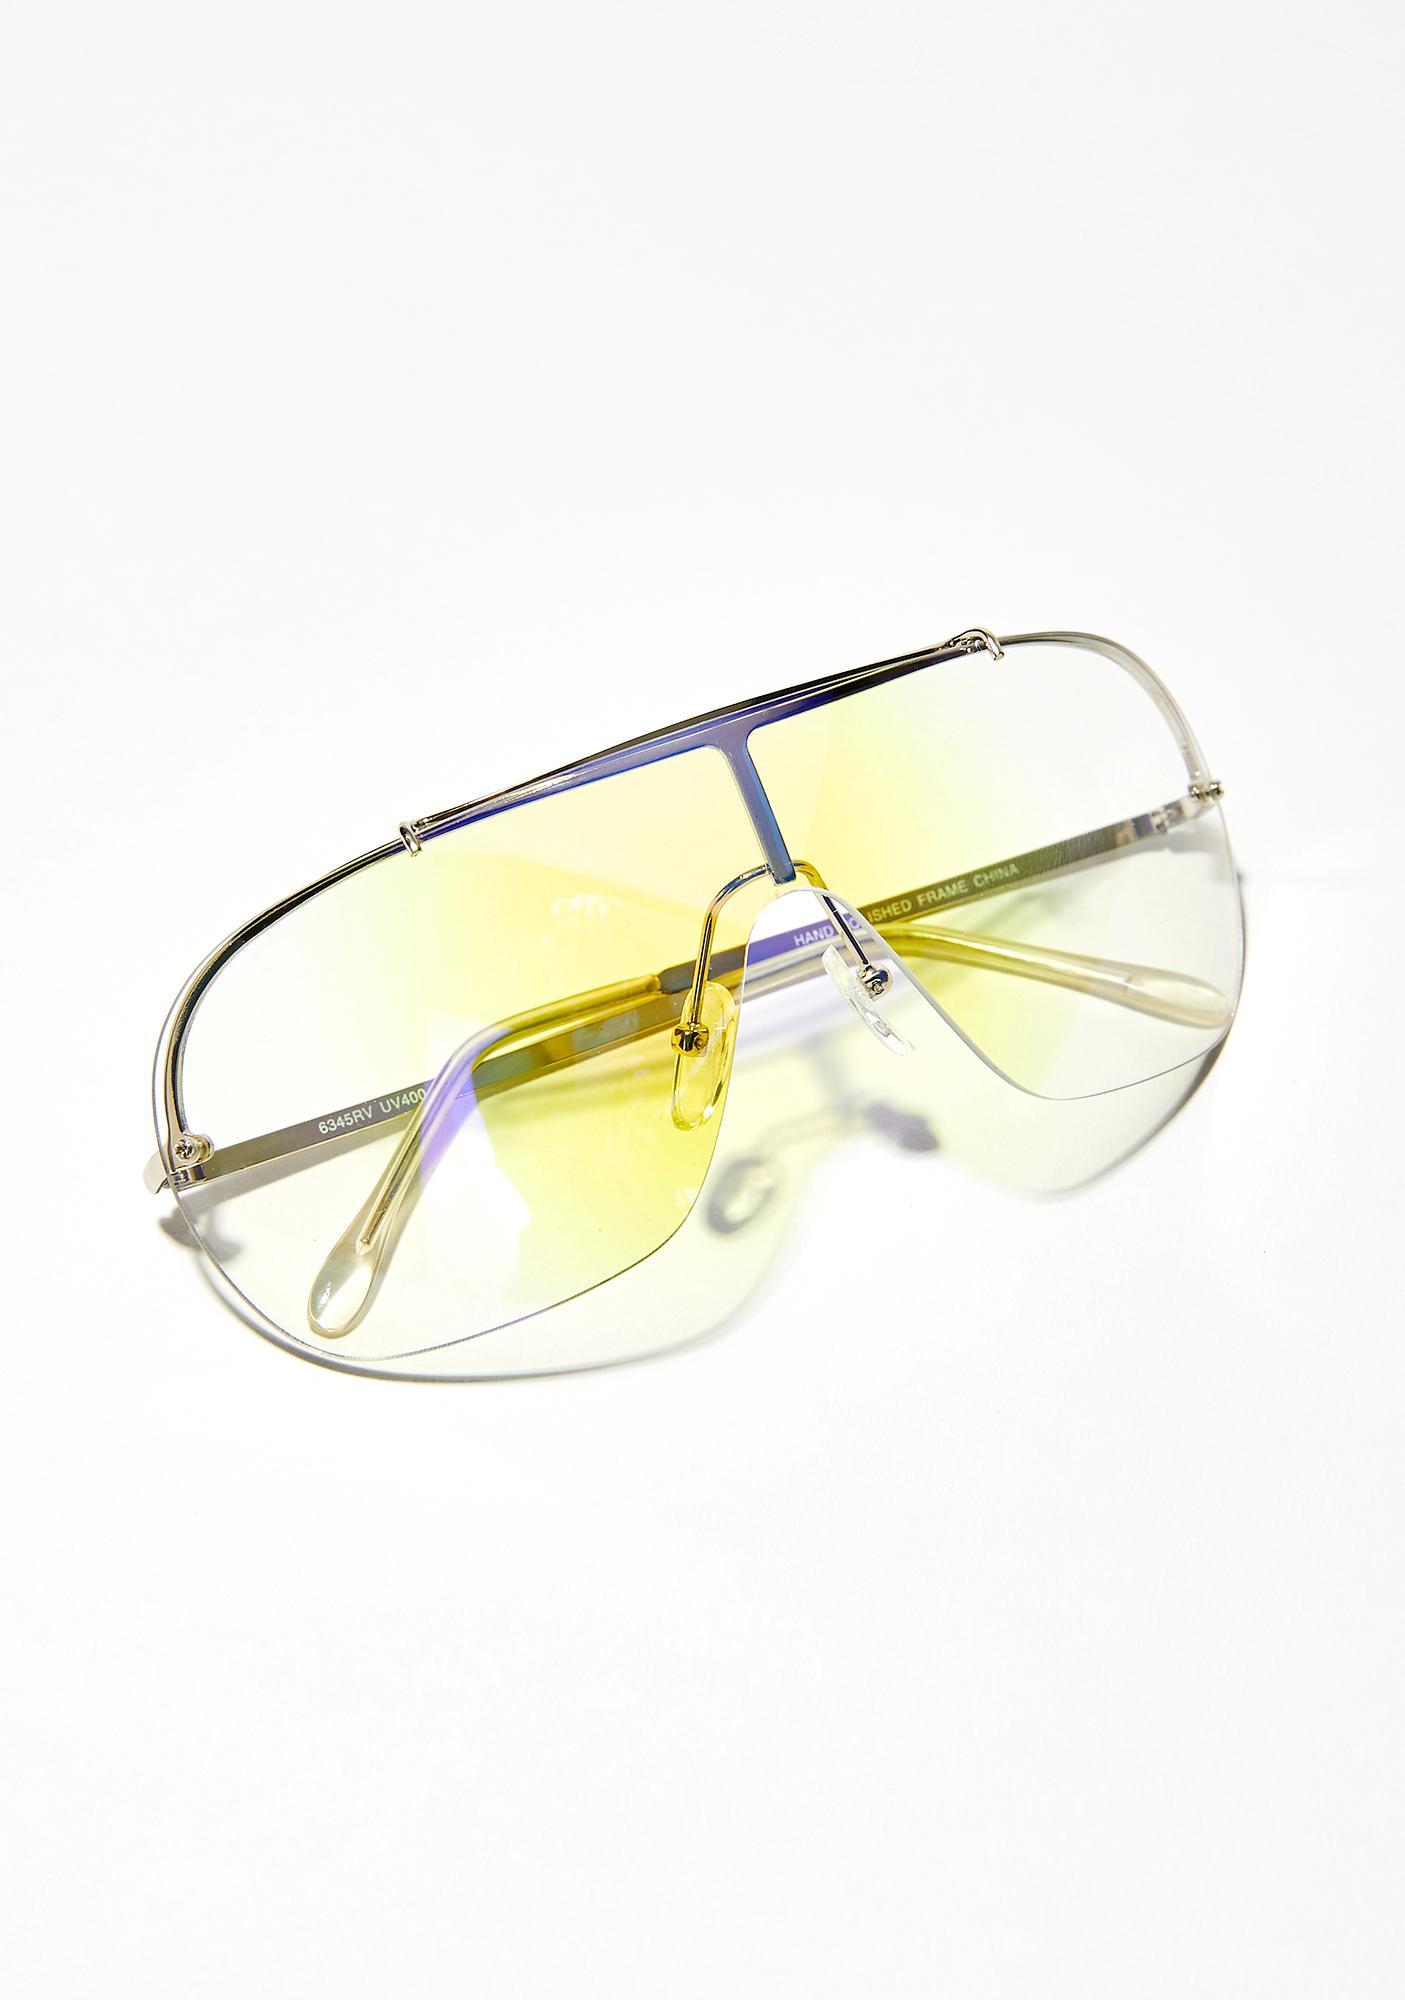 80576c6e4 ... Replay Vintage Sunglasses Bee Prismatic Ecstasy Iridescent Glasses ...